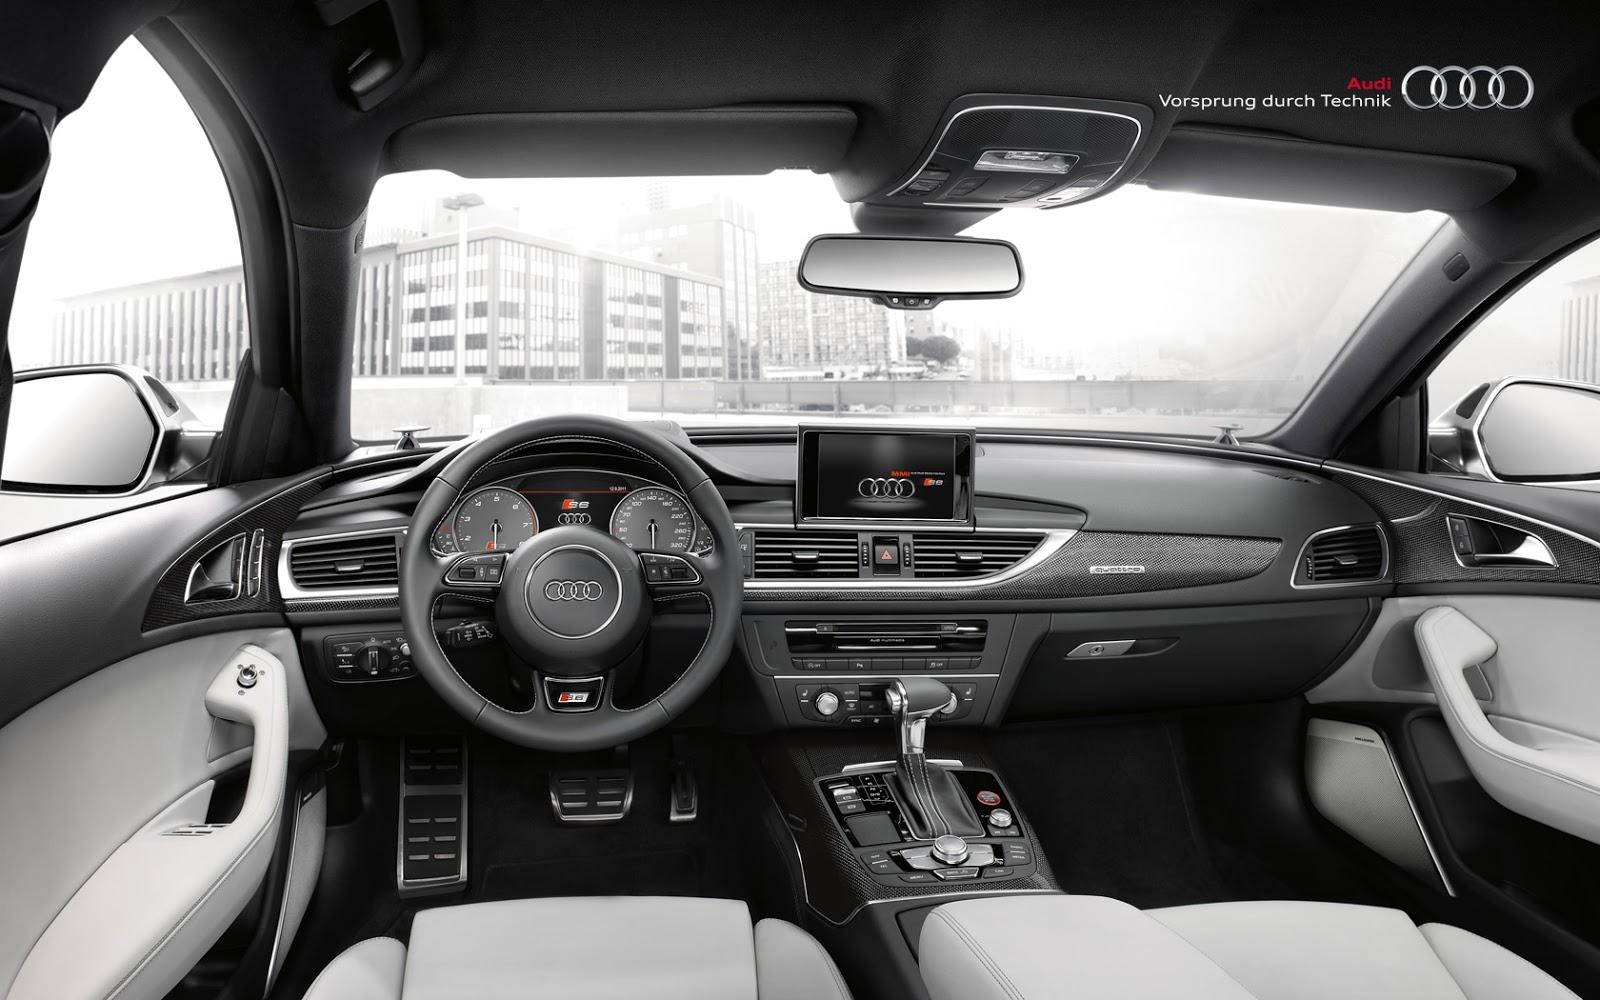 http://2.bp.blogspot.com/-Jsz4Vjf85UA/UKcUch0eSTI/AAAAAAAAI20/fNI9jHFSKdA/s1600/Audi-S6-A6-interior-cockpit-dashboard-front-seat-steering-wallpaper.jpg